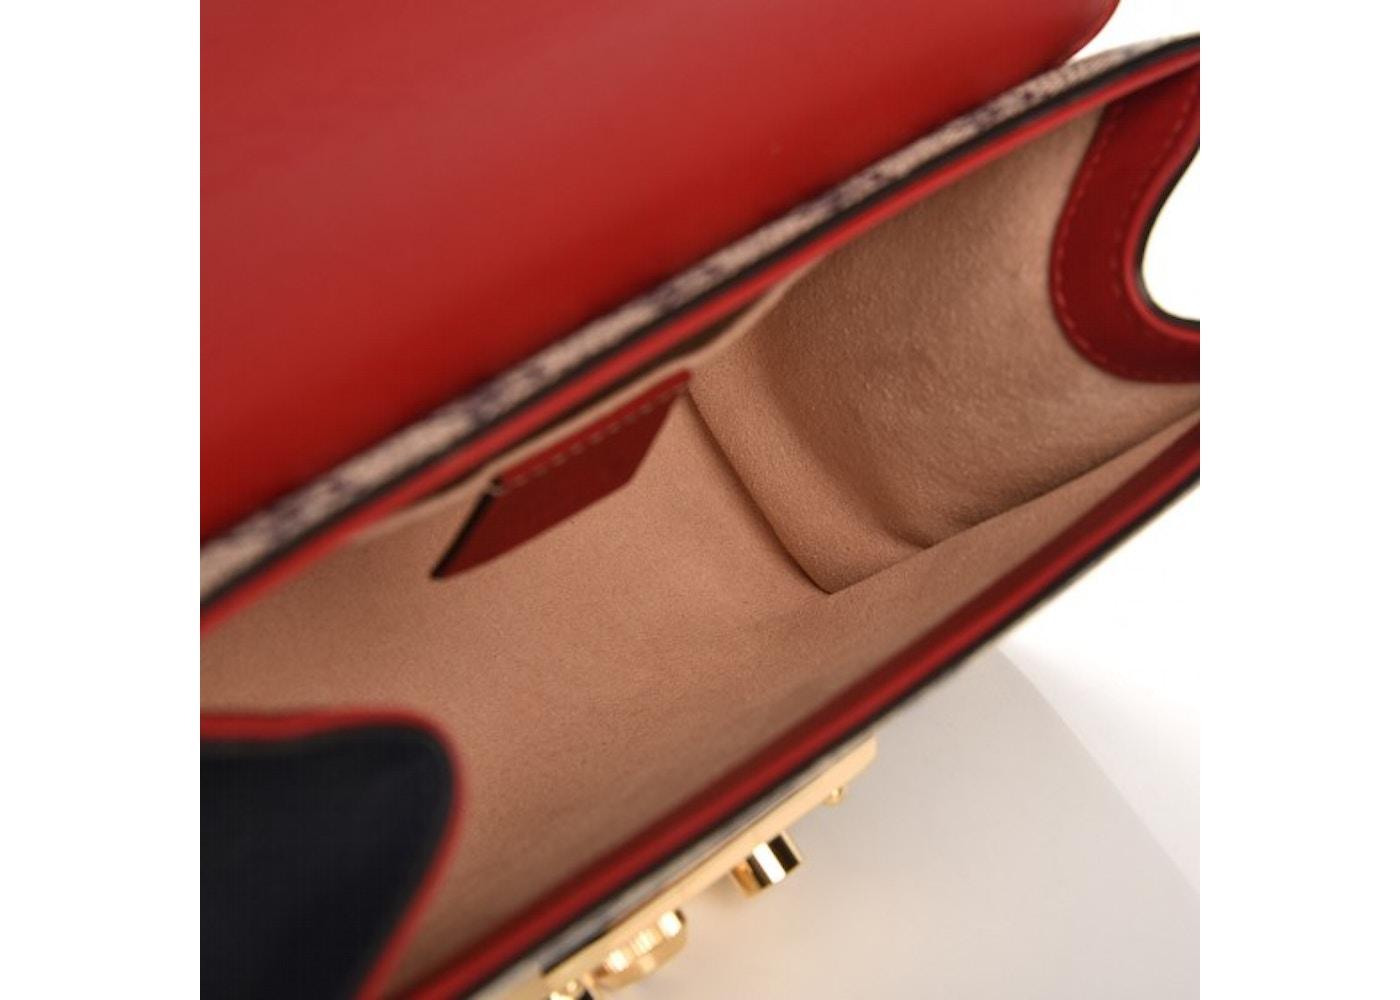 1f4475c87c21 Gucci Padlock Shoulder Bag Monogram GG Supreme Small Navy Beige Red